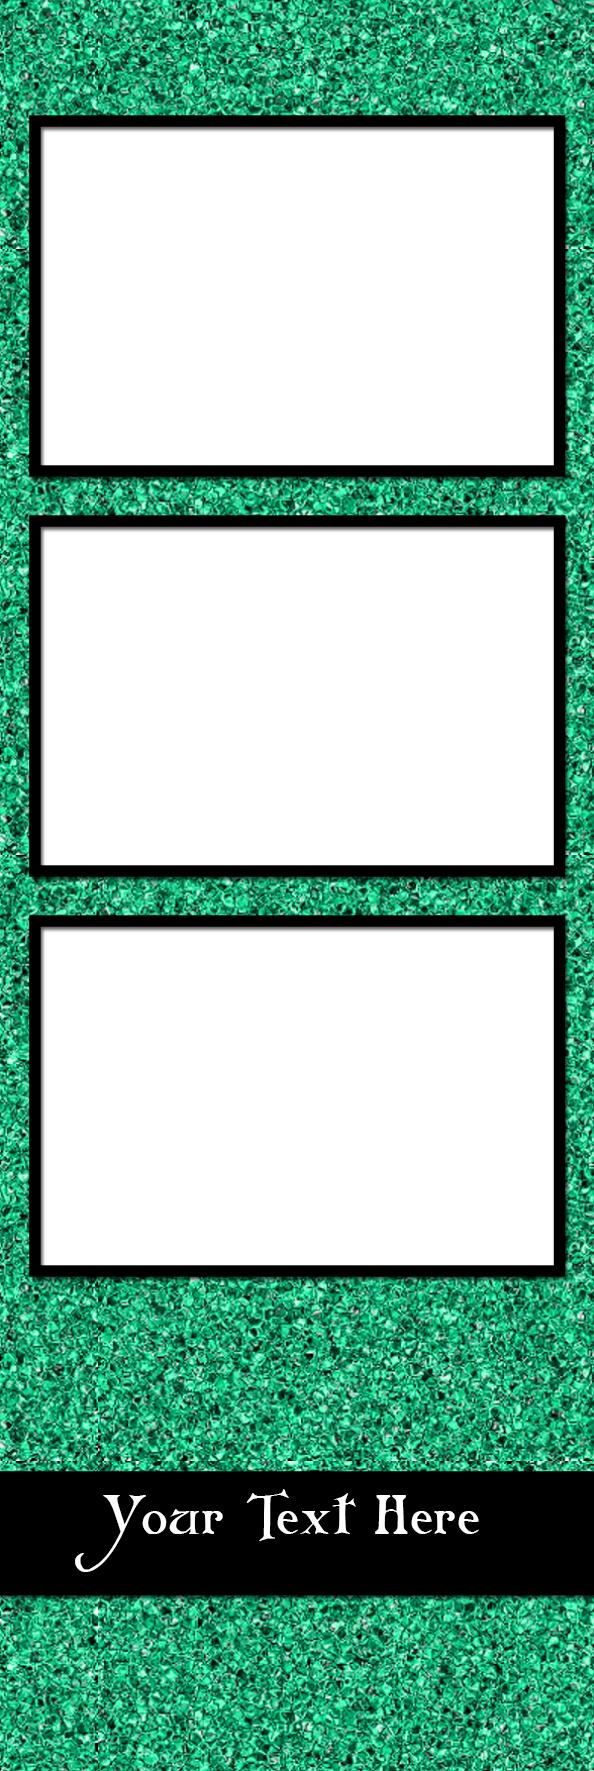 Texture_Glitter-V-6P6.jpg